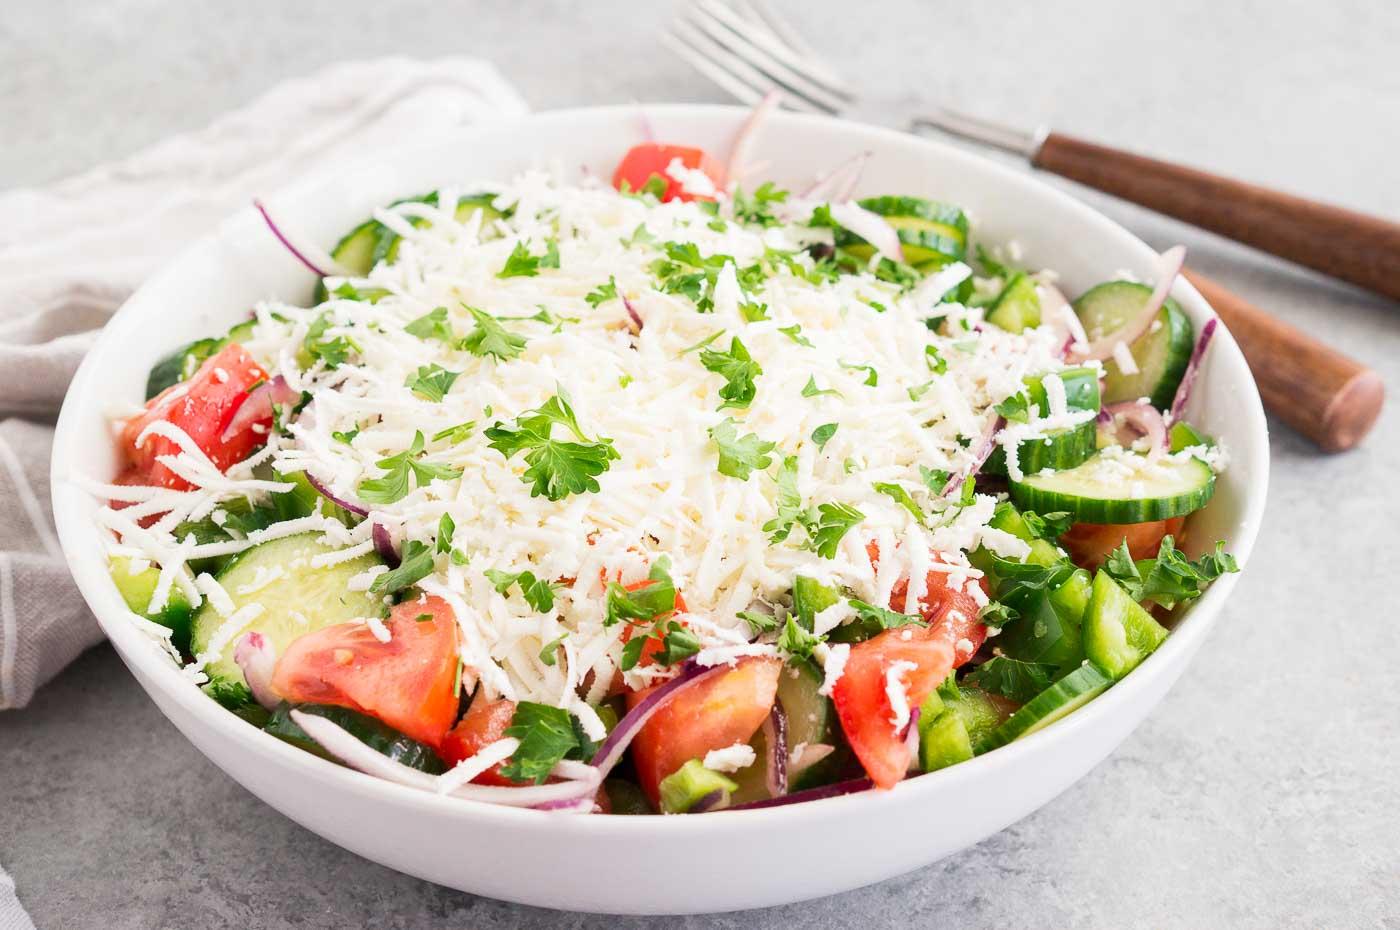 shopska salad in a white bowl